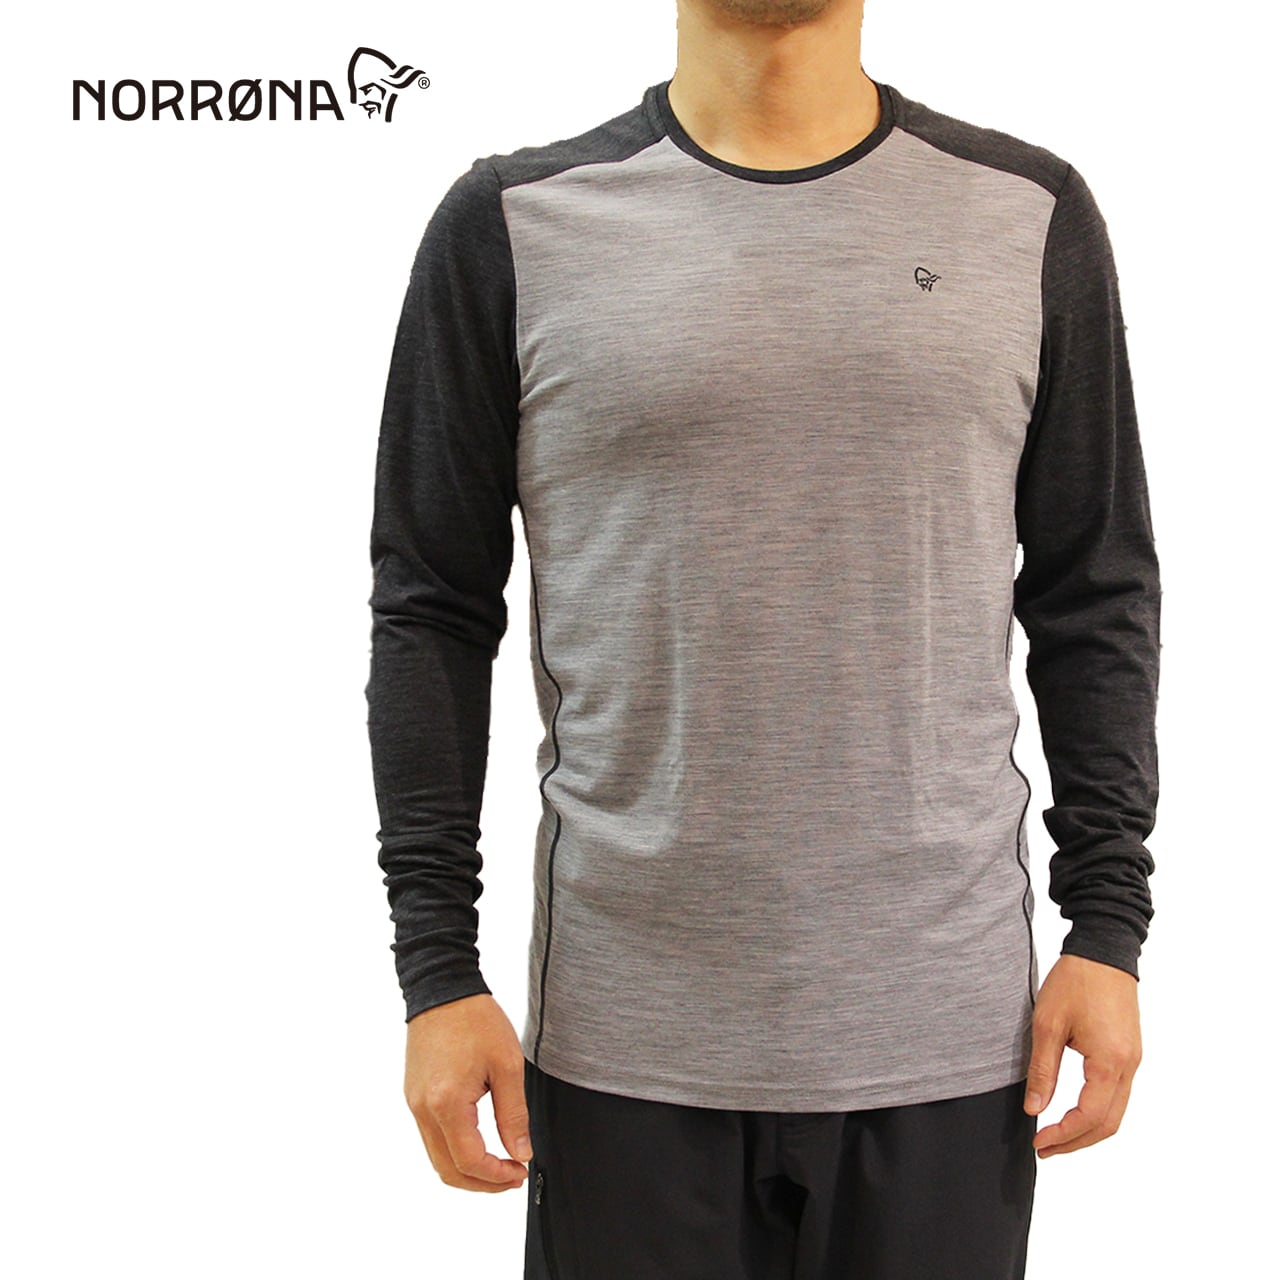 NORRONA   Wool round Neck